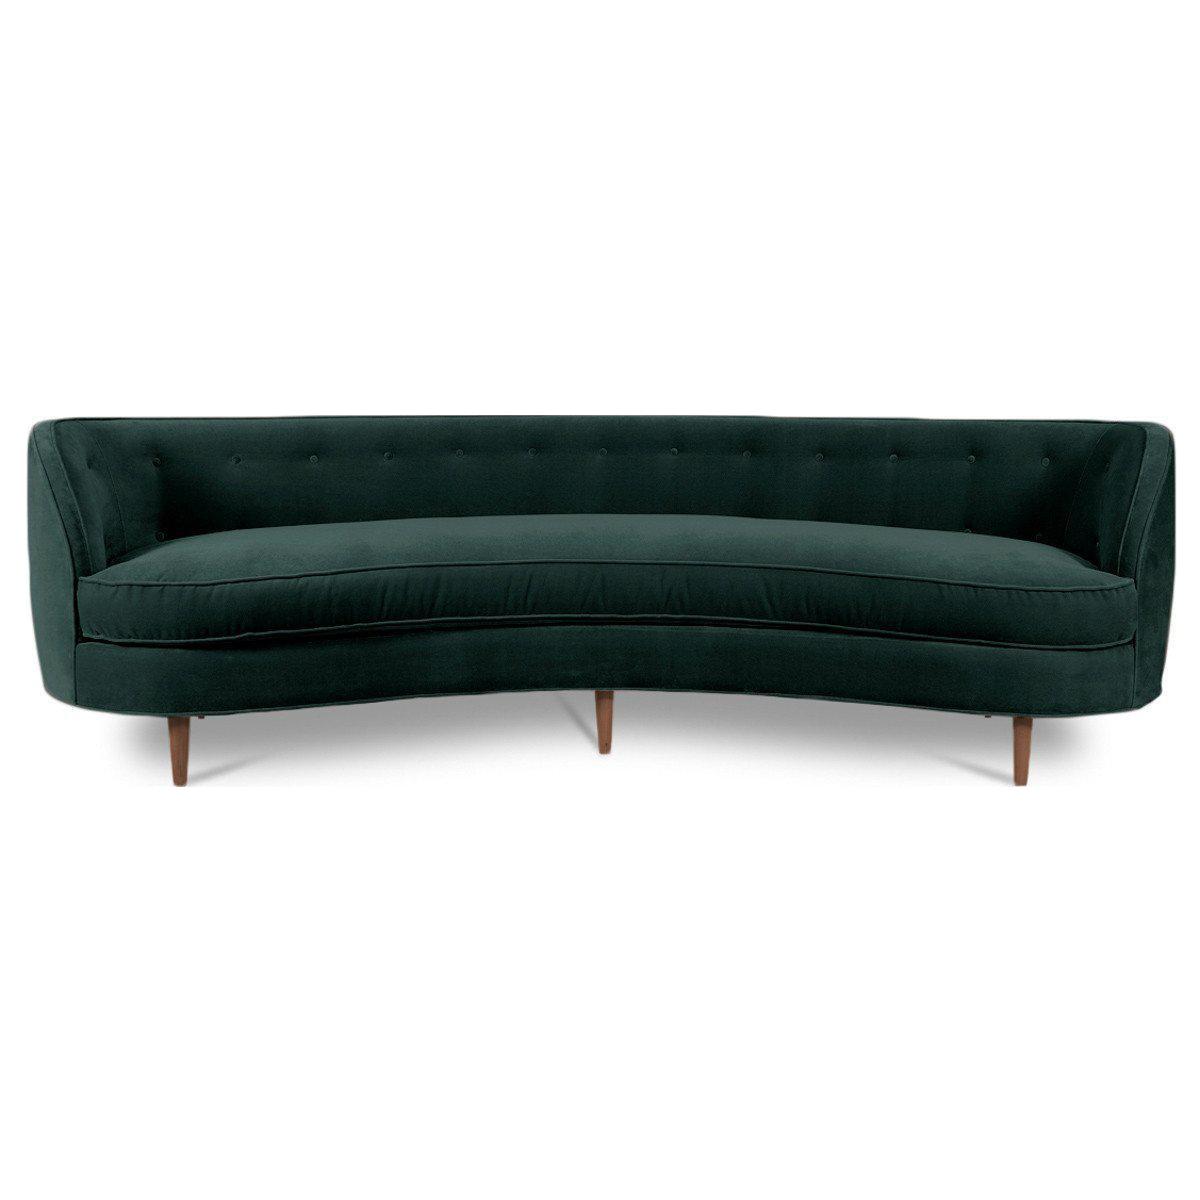 St. Tropez Curved Sofa on Chairish